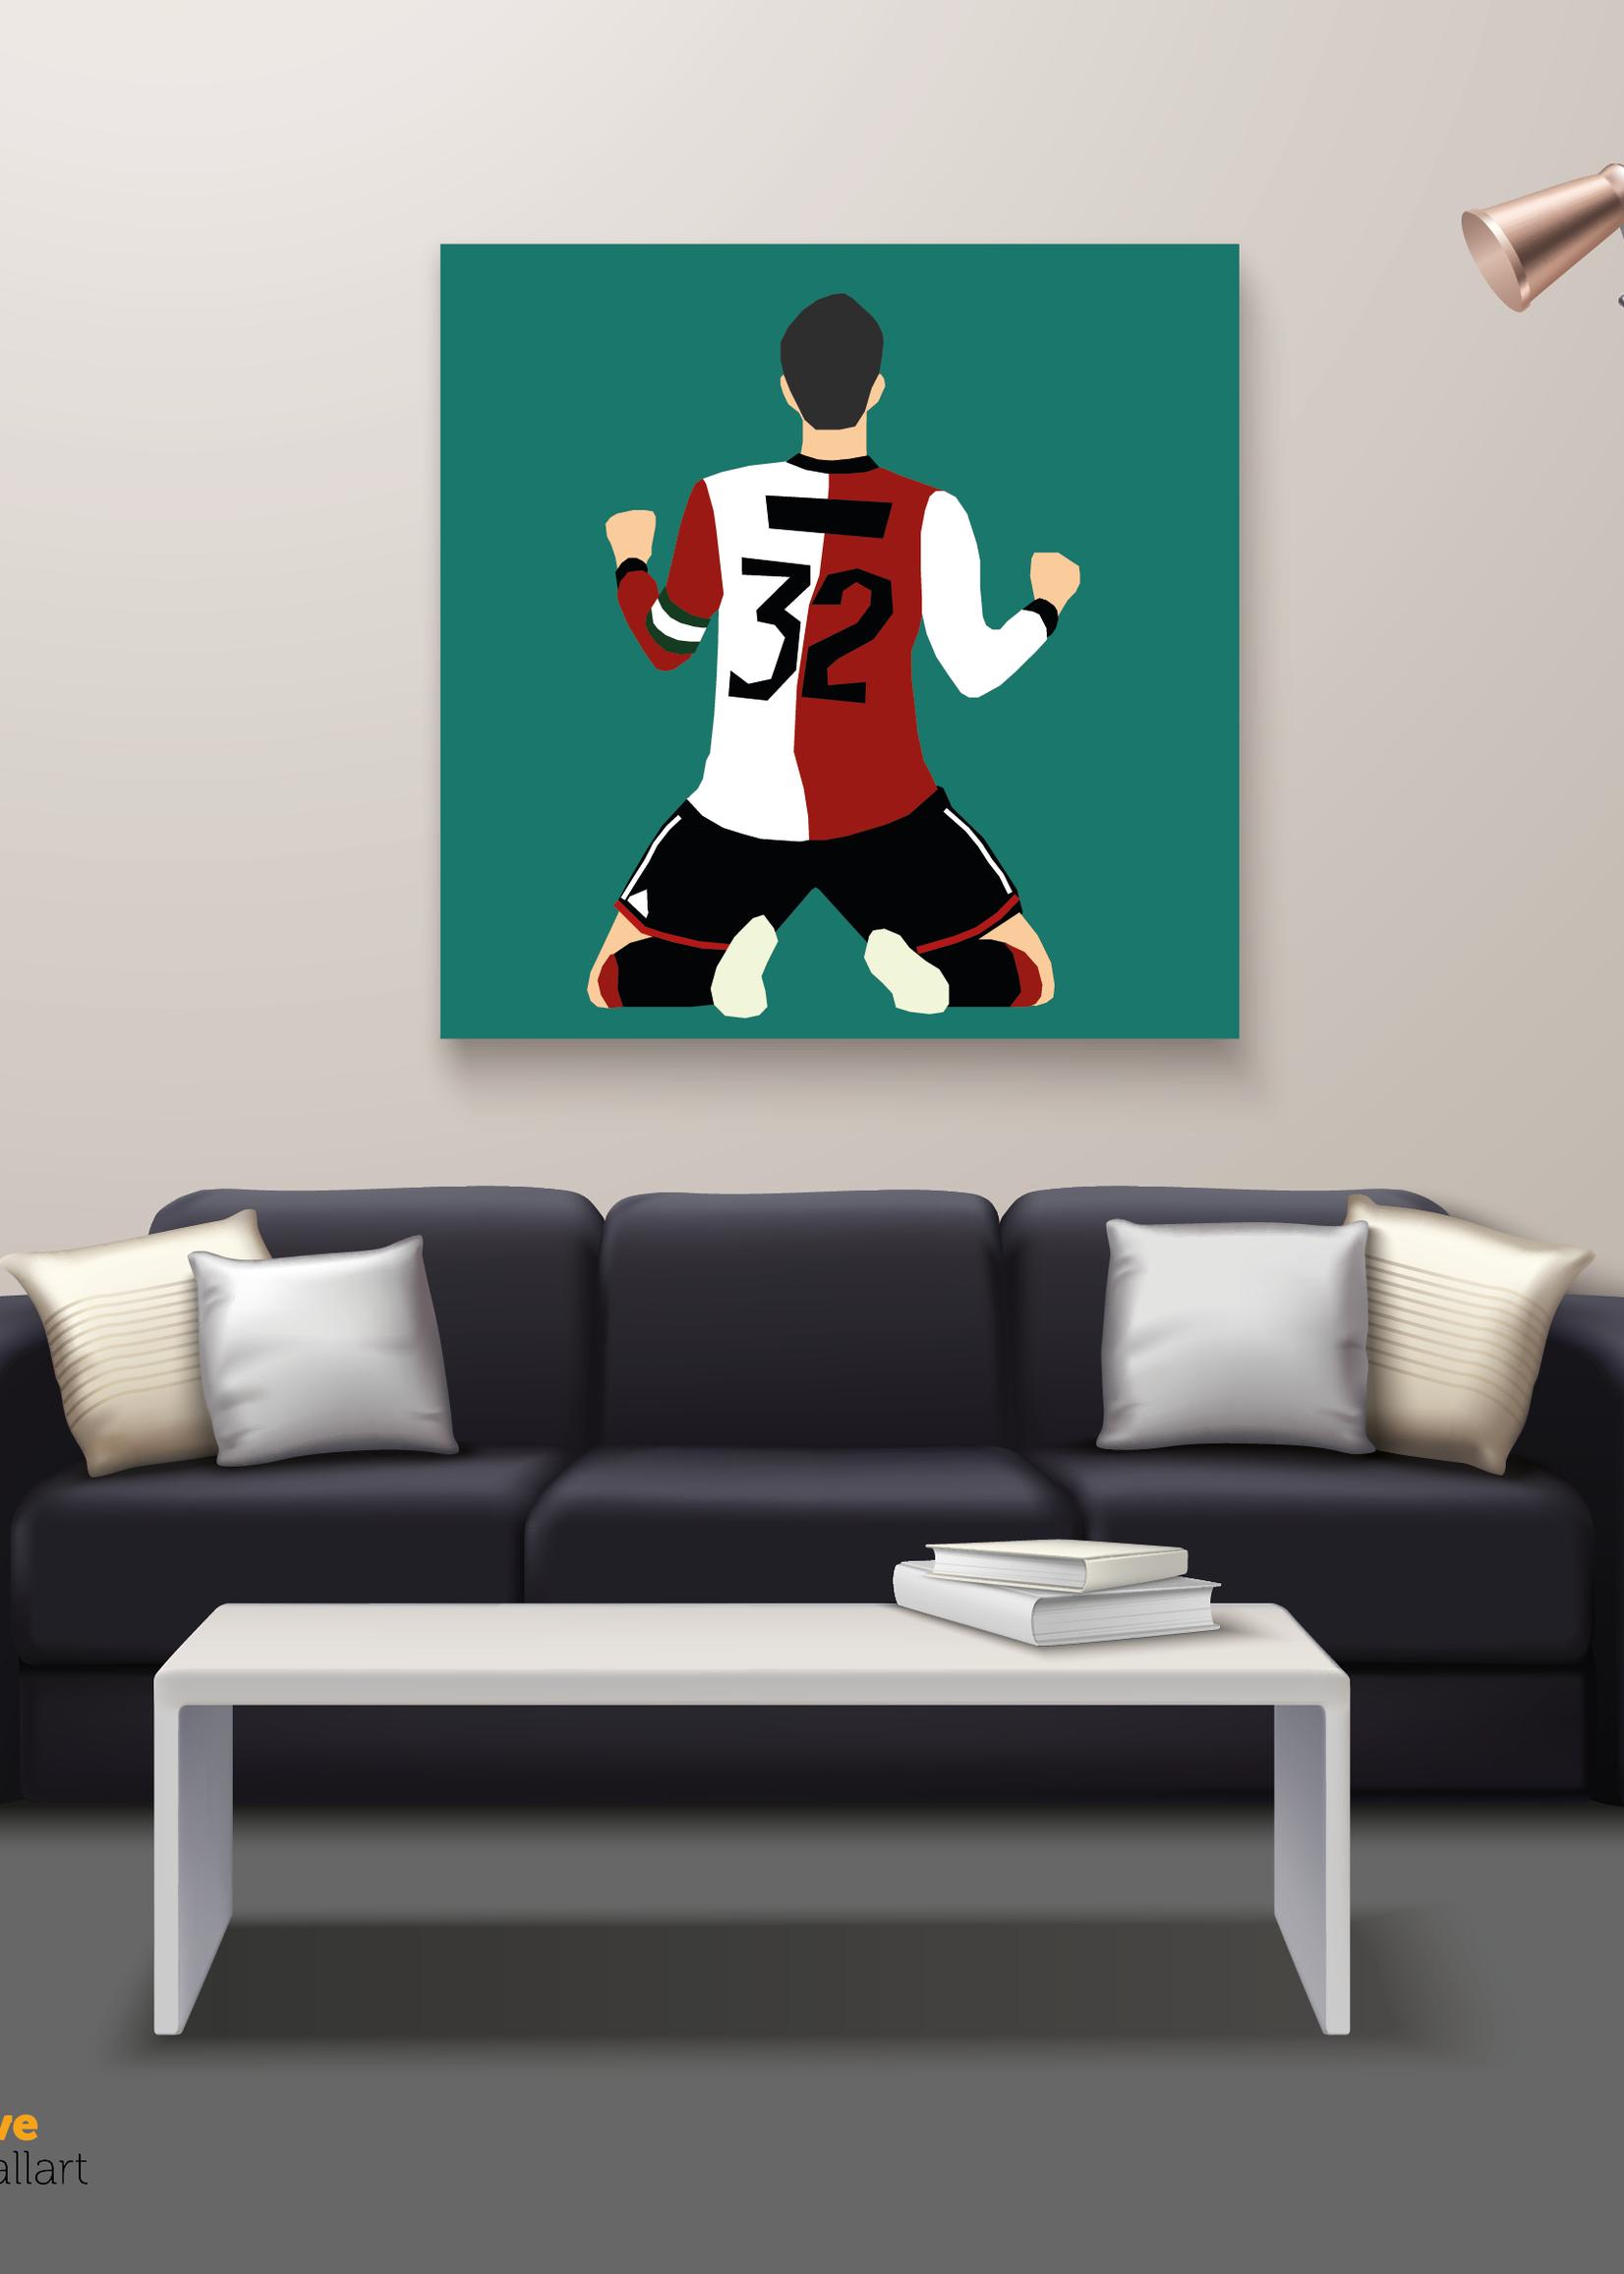 We Love Football Art Grey Fox We Love Football Art